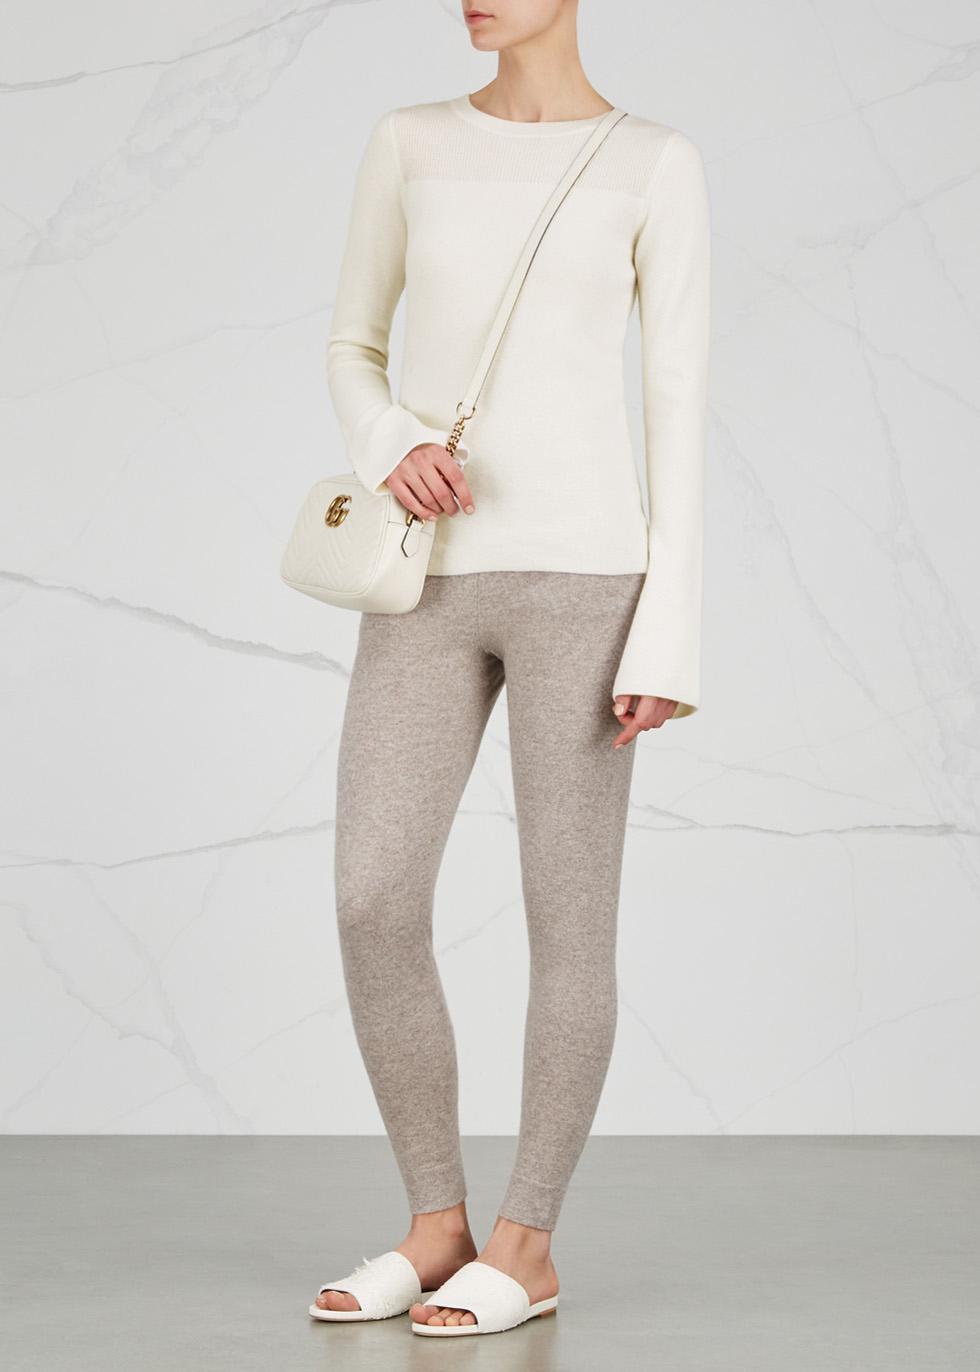 Boston bell-sleeve cashmere jumper - Le Kasha